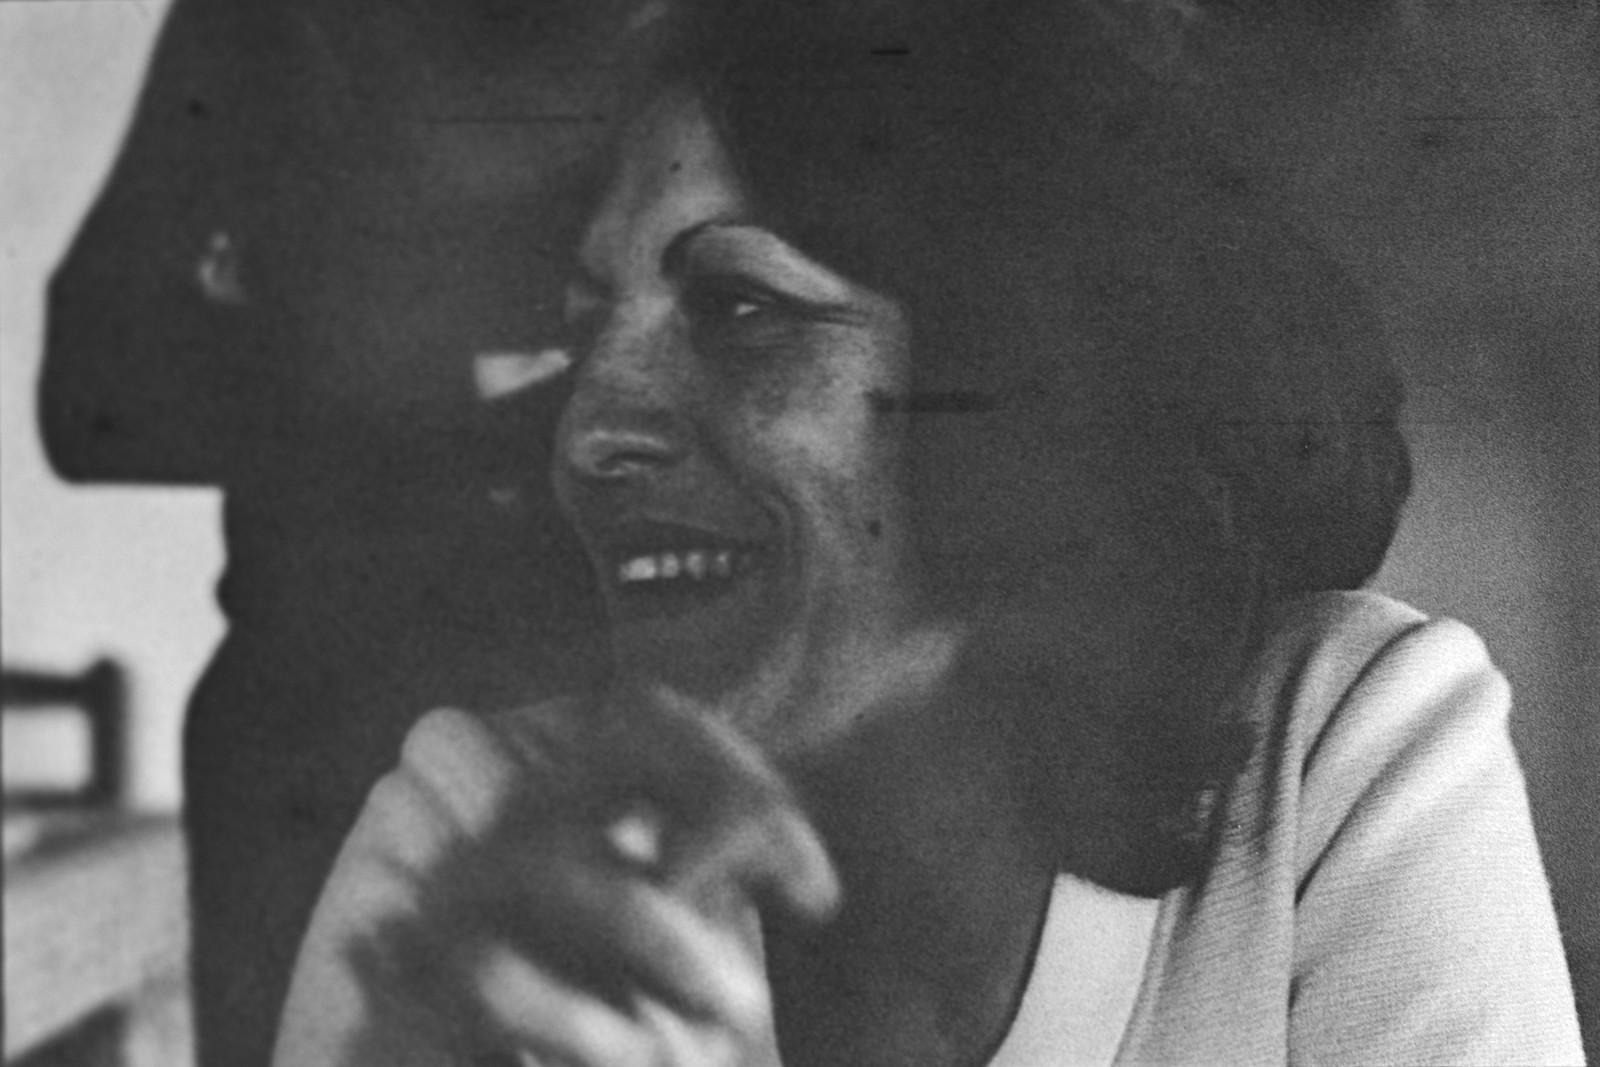 Mª Ángeles Manrique de Lara II